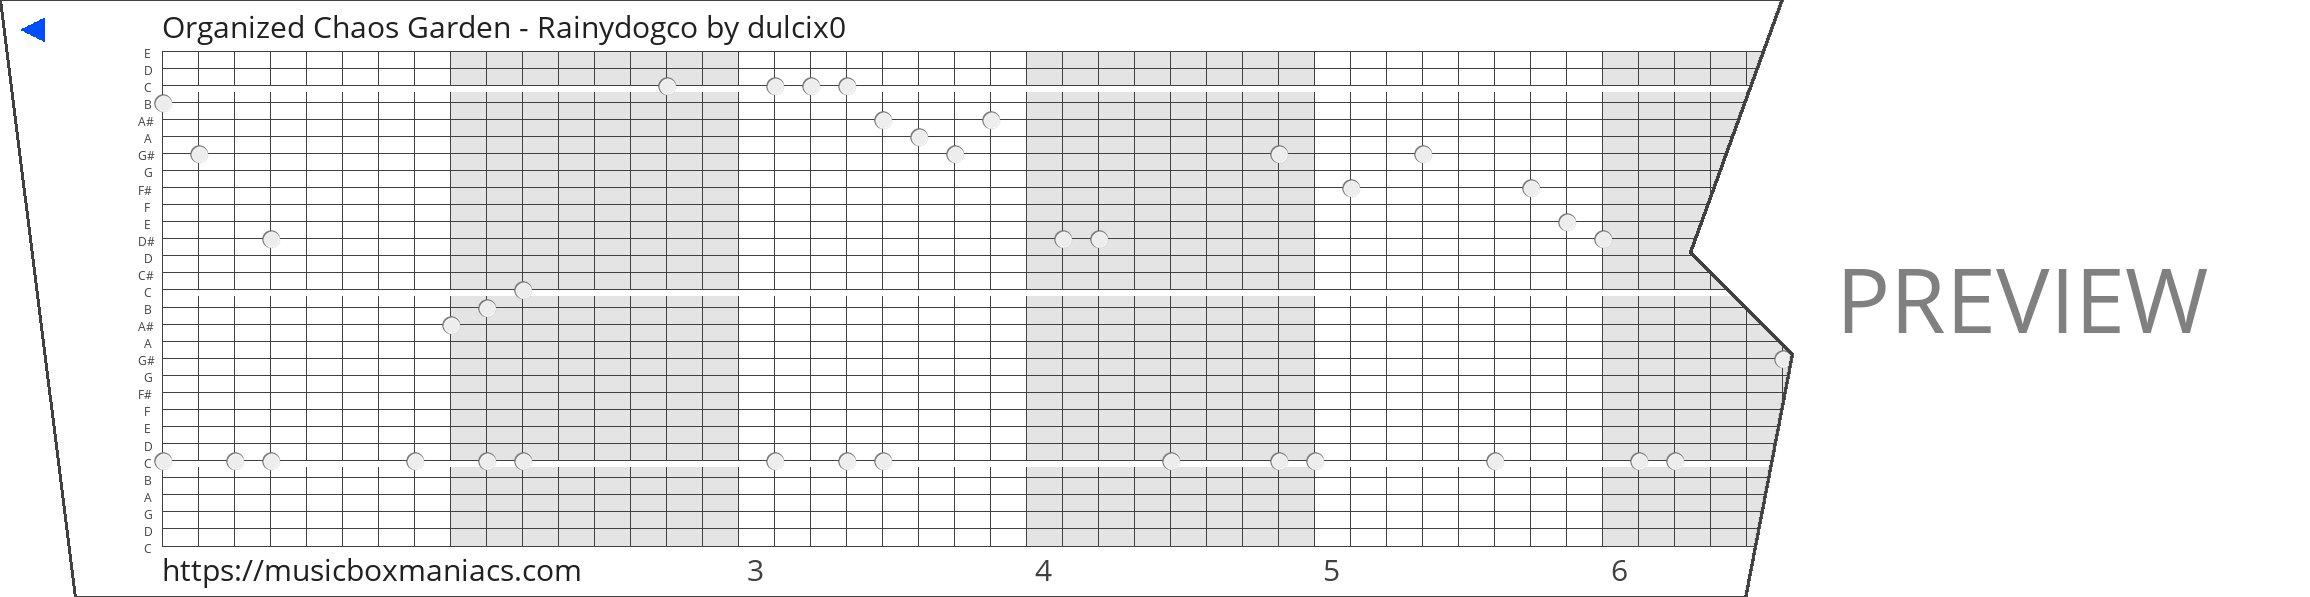 Organized Chaos Garden - Rainydogco 30 note music box paper strip